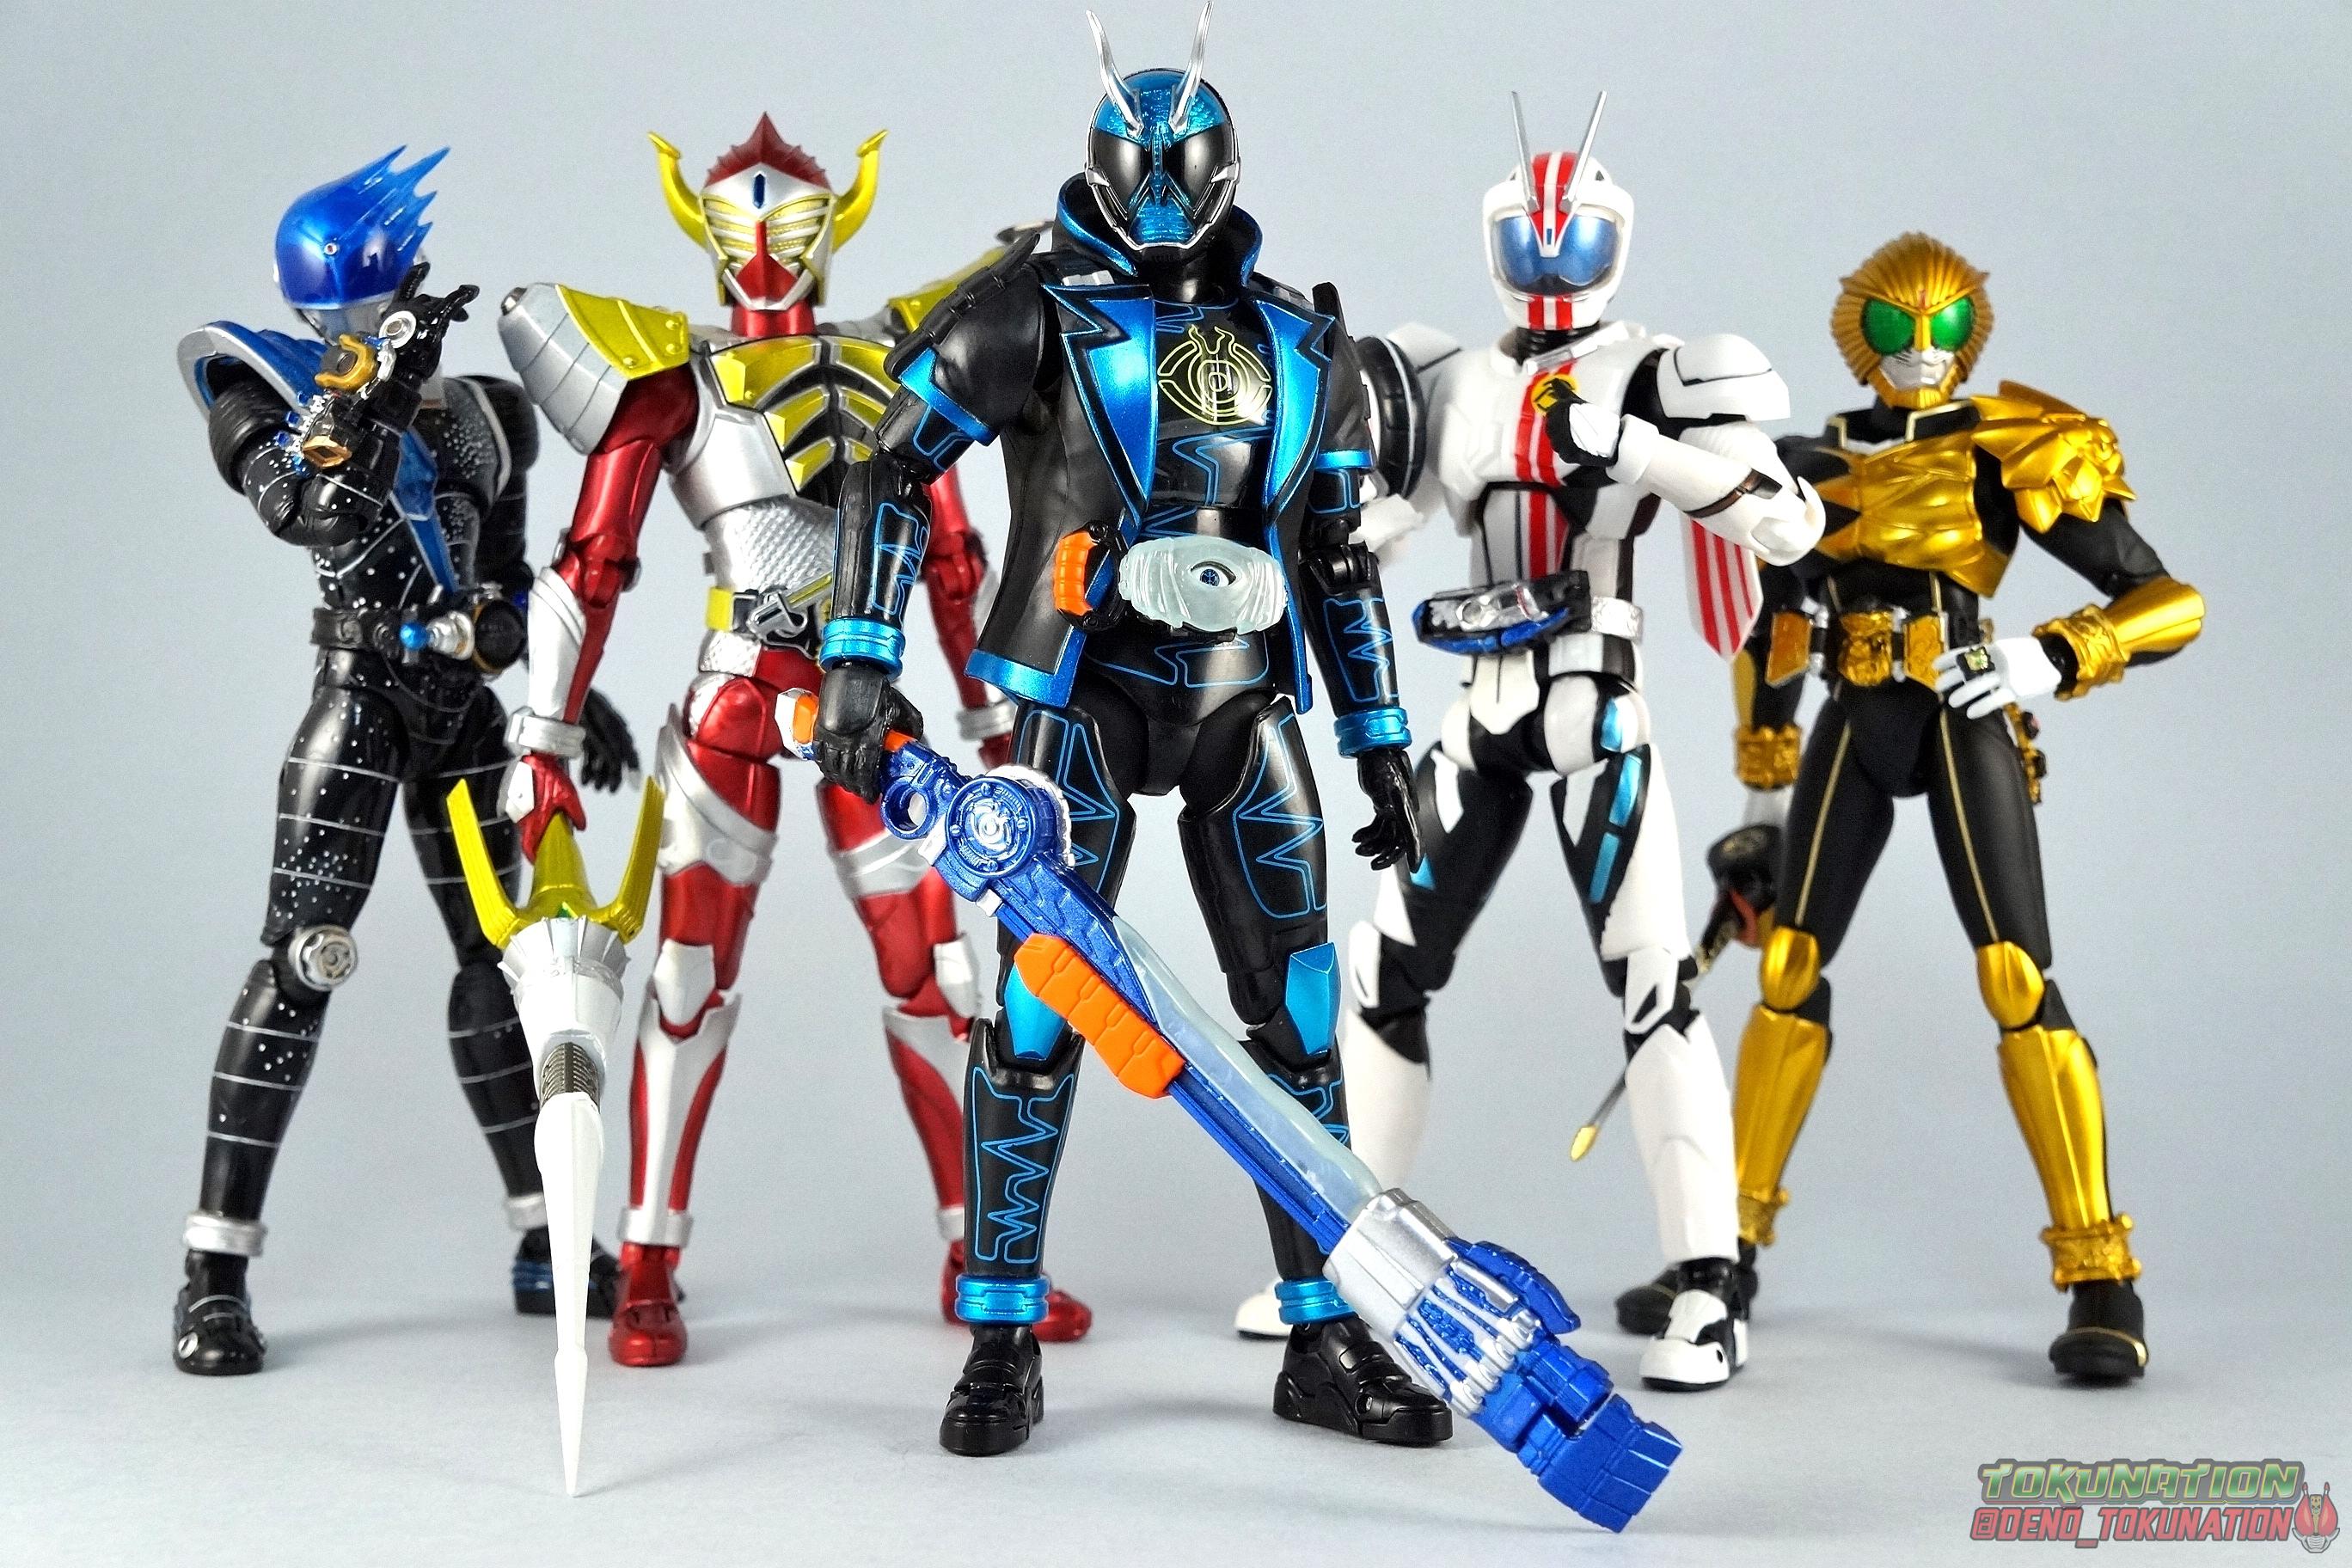 Figuarts Kamen Rider Specter Specter Damashii Bandai Tamashii Nations S.H